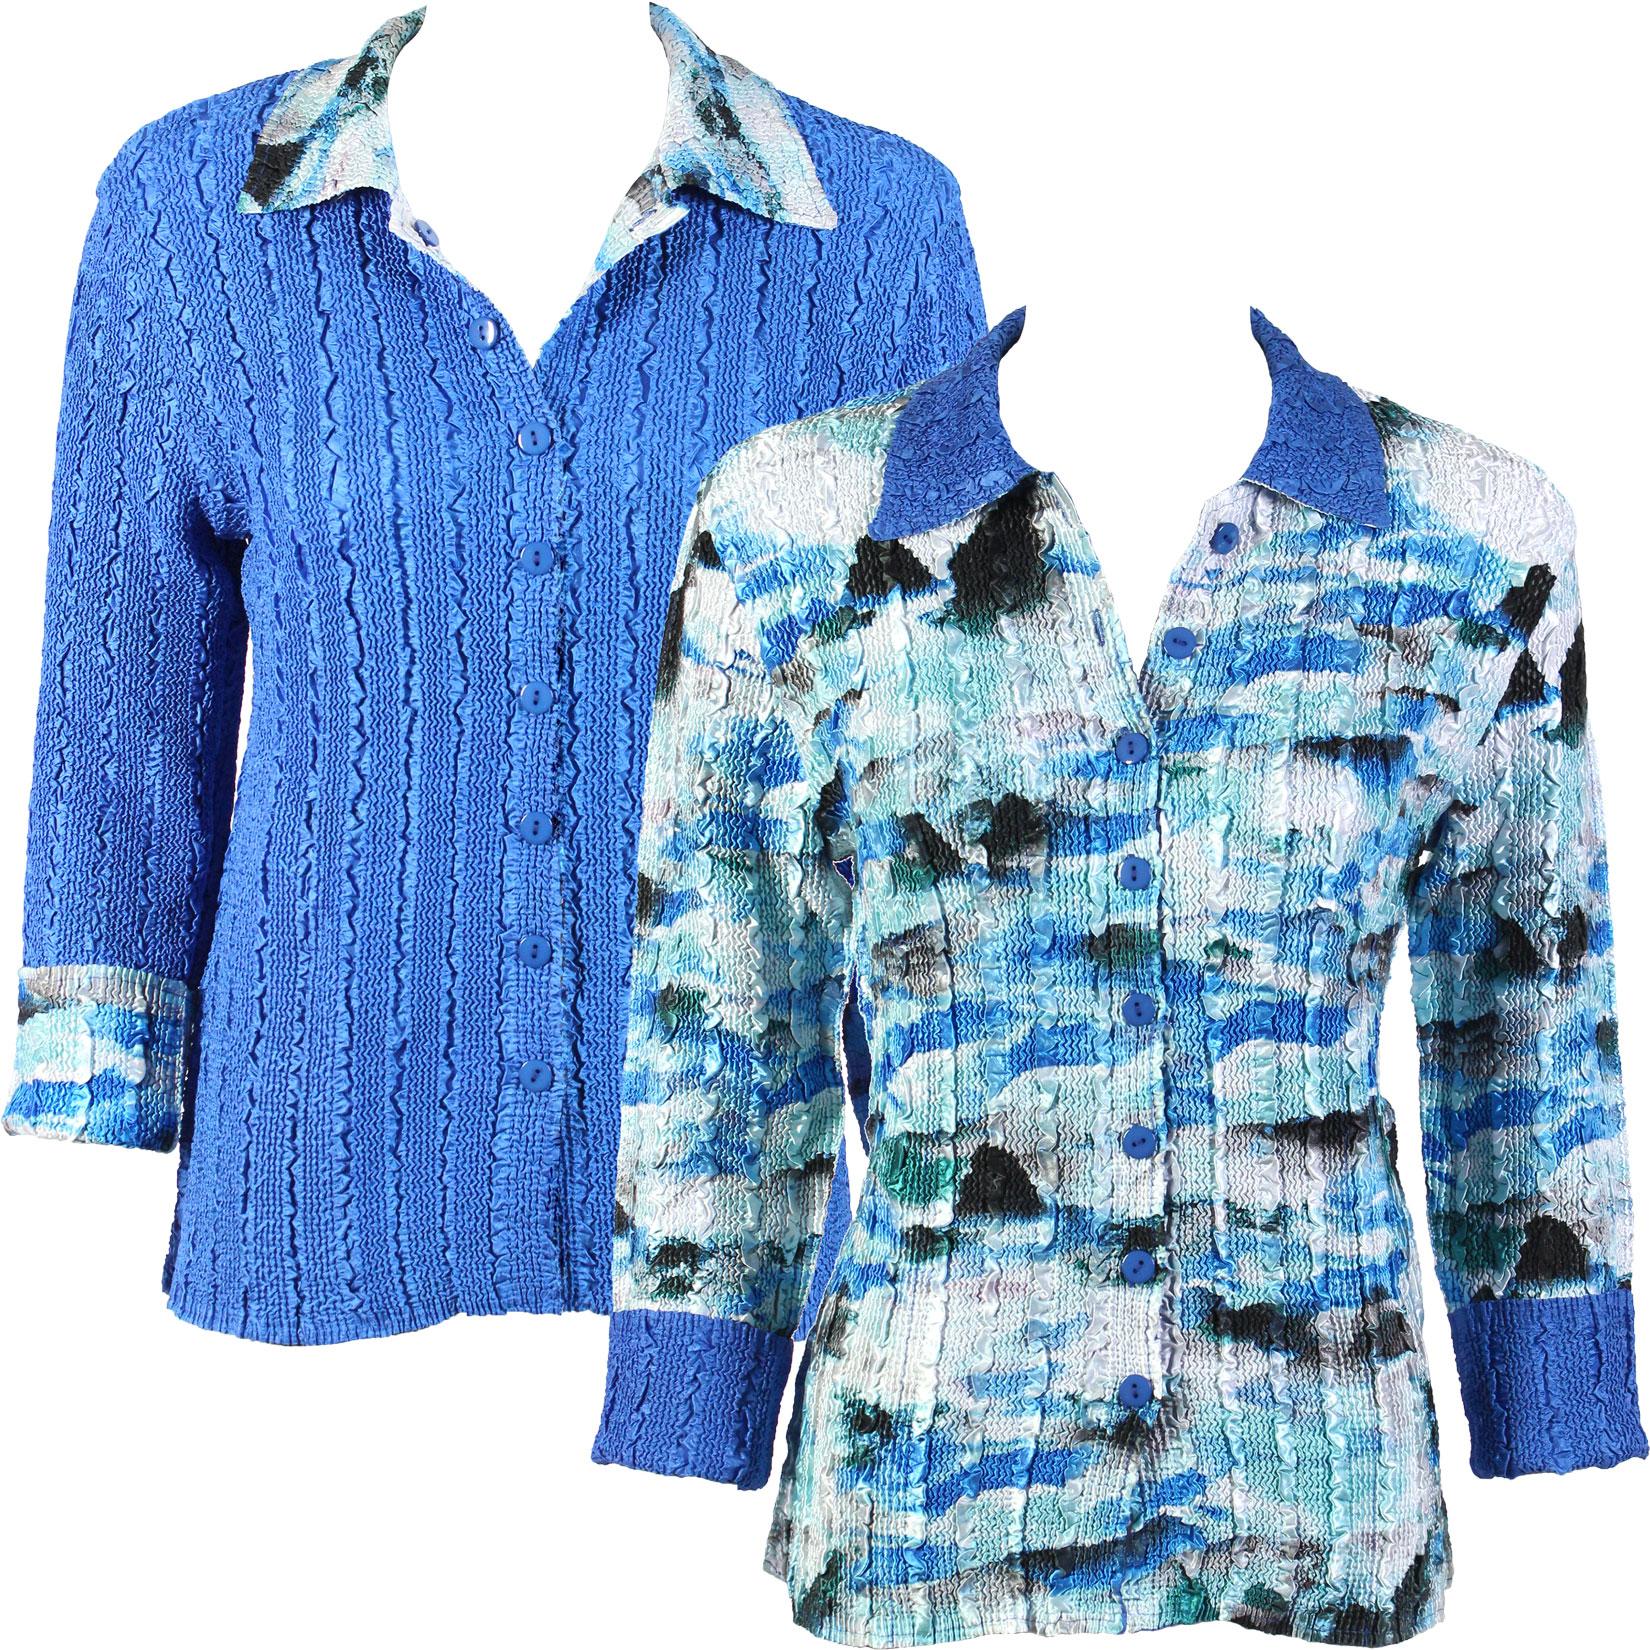 Wholesale Magic Crush - Reversible Jackets #5407 - S-M